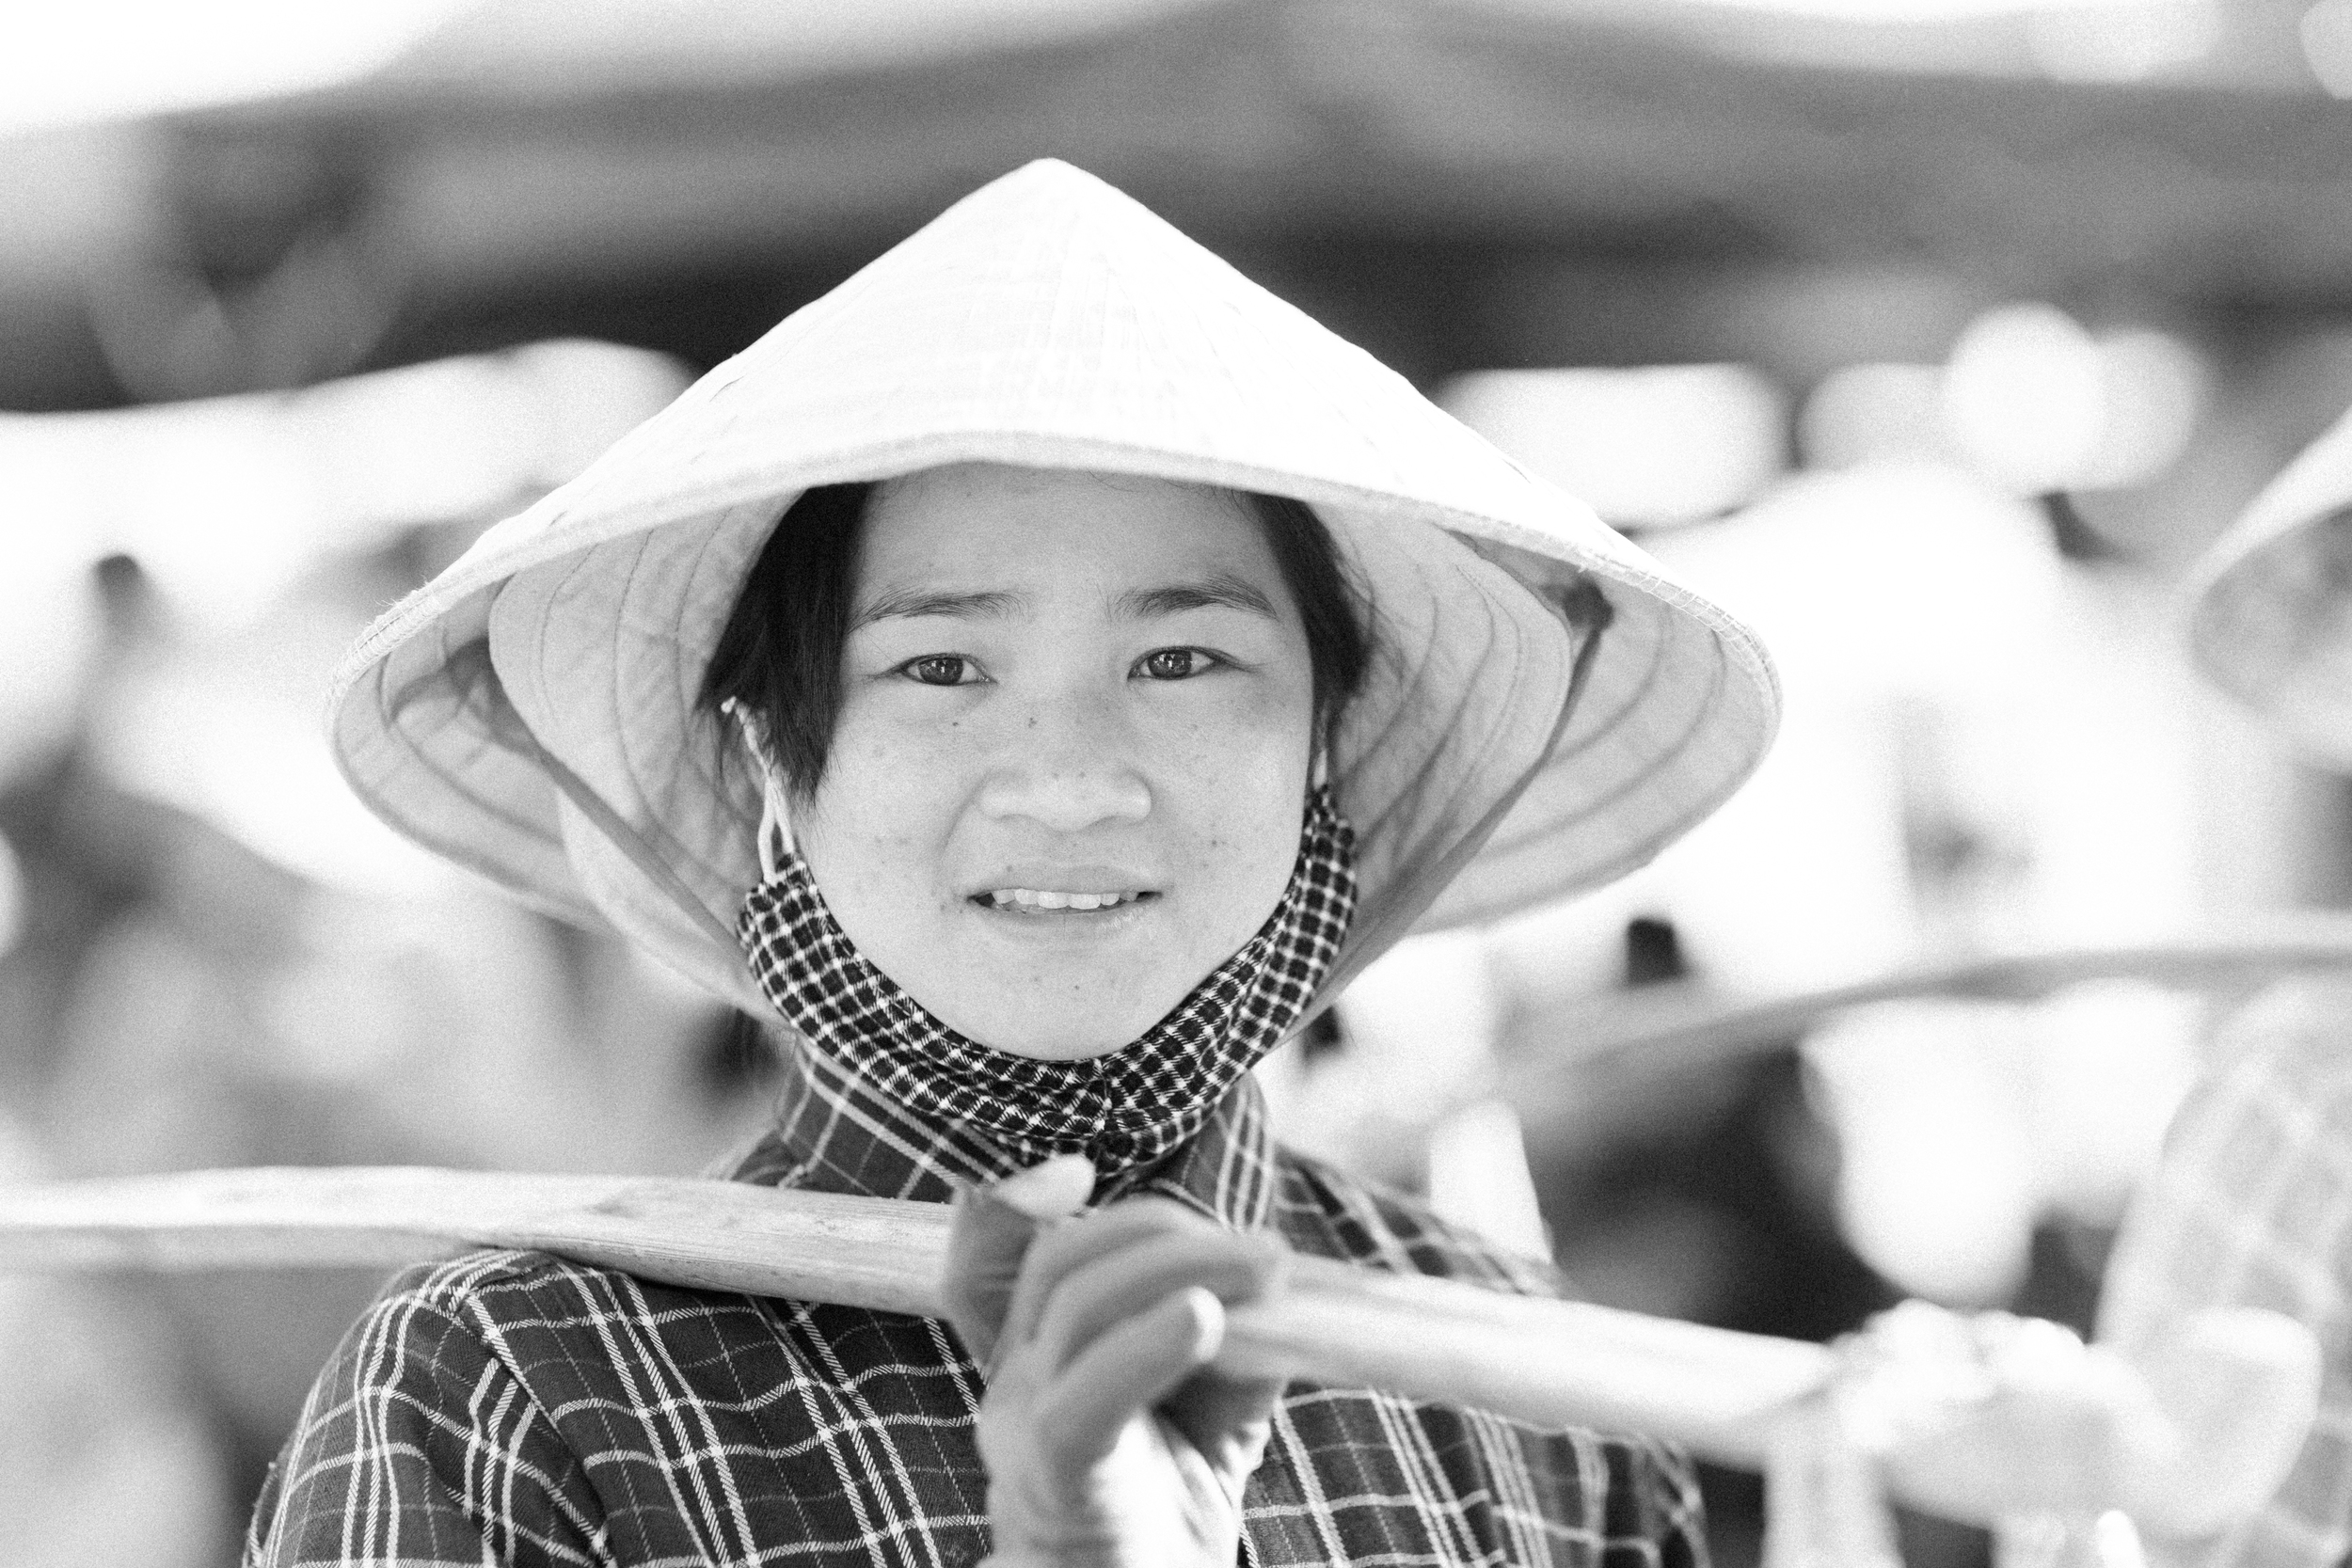 Cari Zhu Photography - Hoi An Vietnam South East Asia Travel-9993.jpg